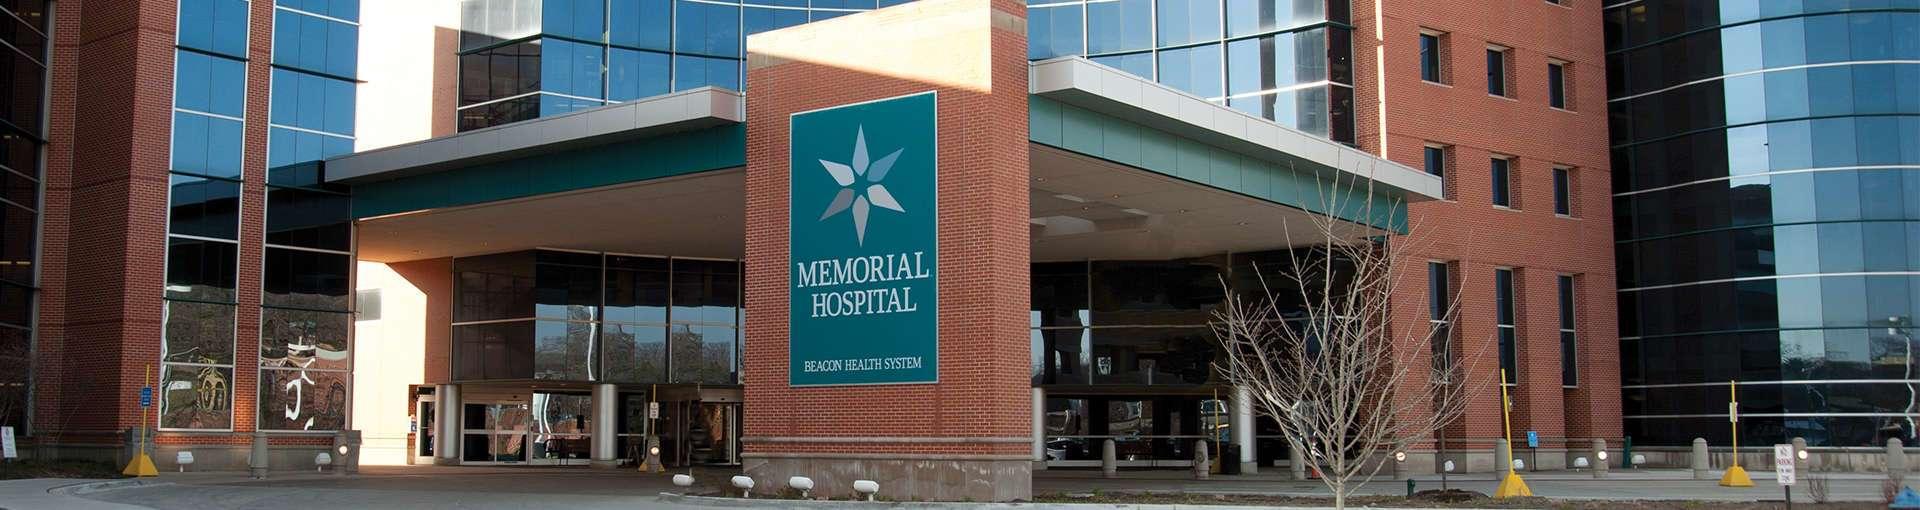 Memorial Hospital main entrance